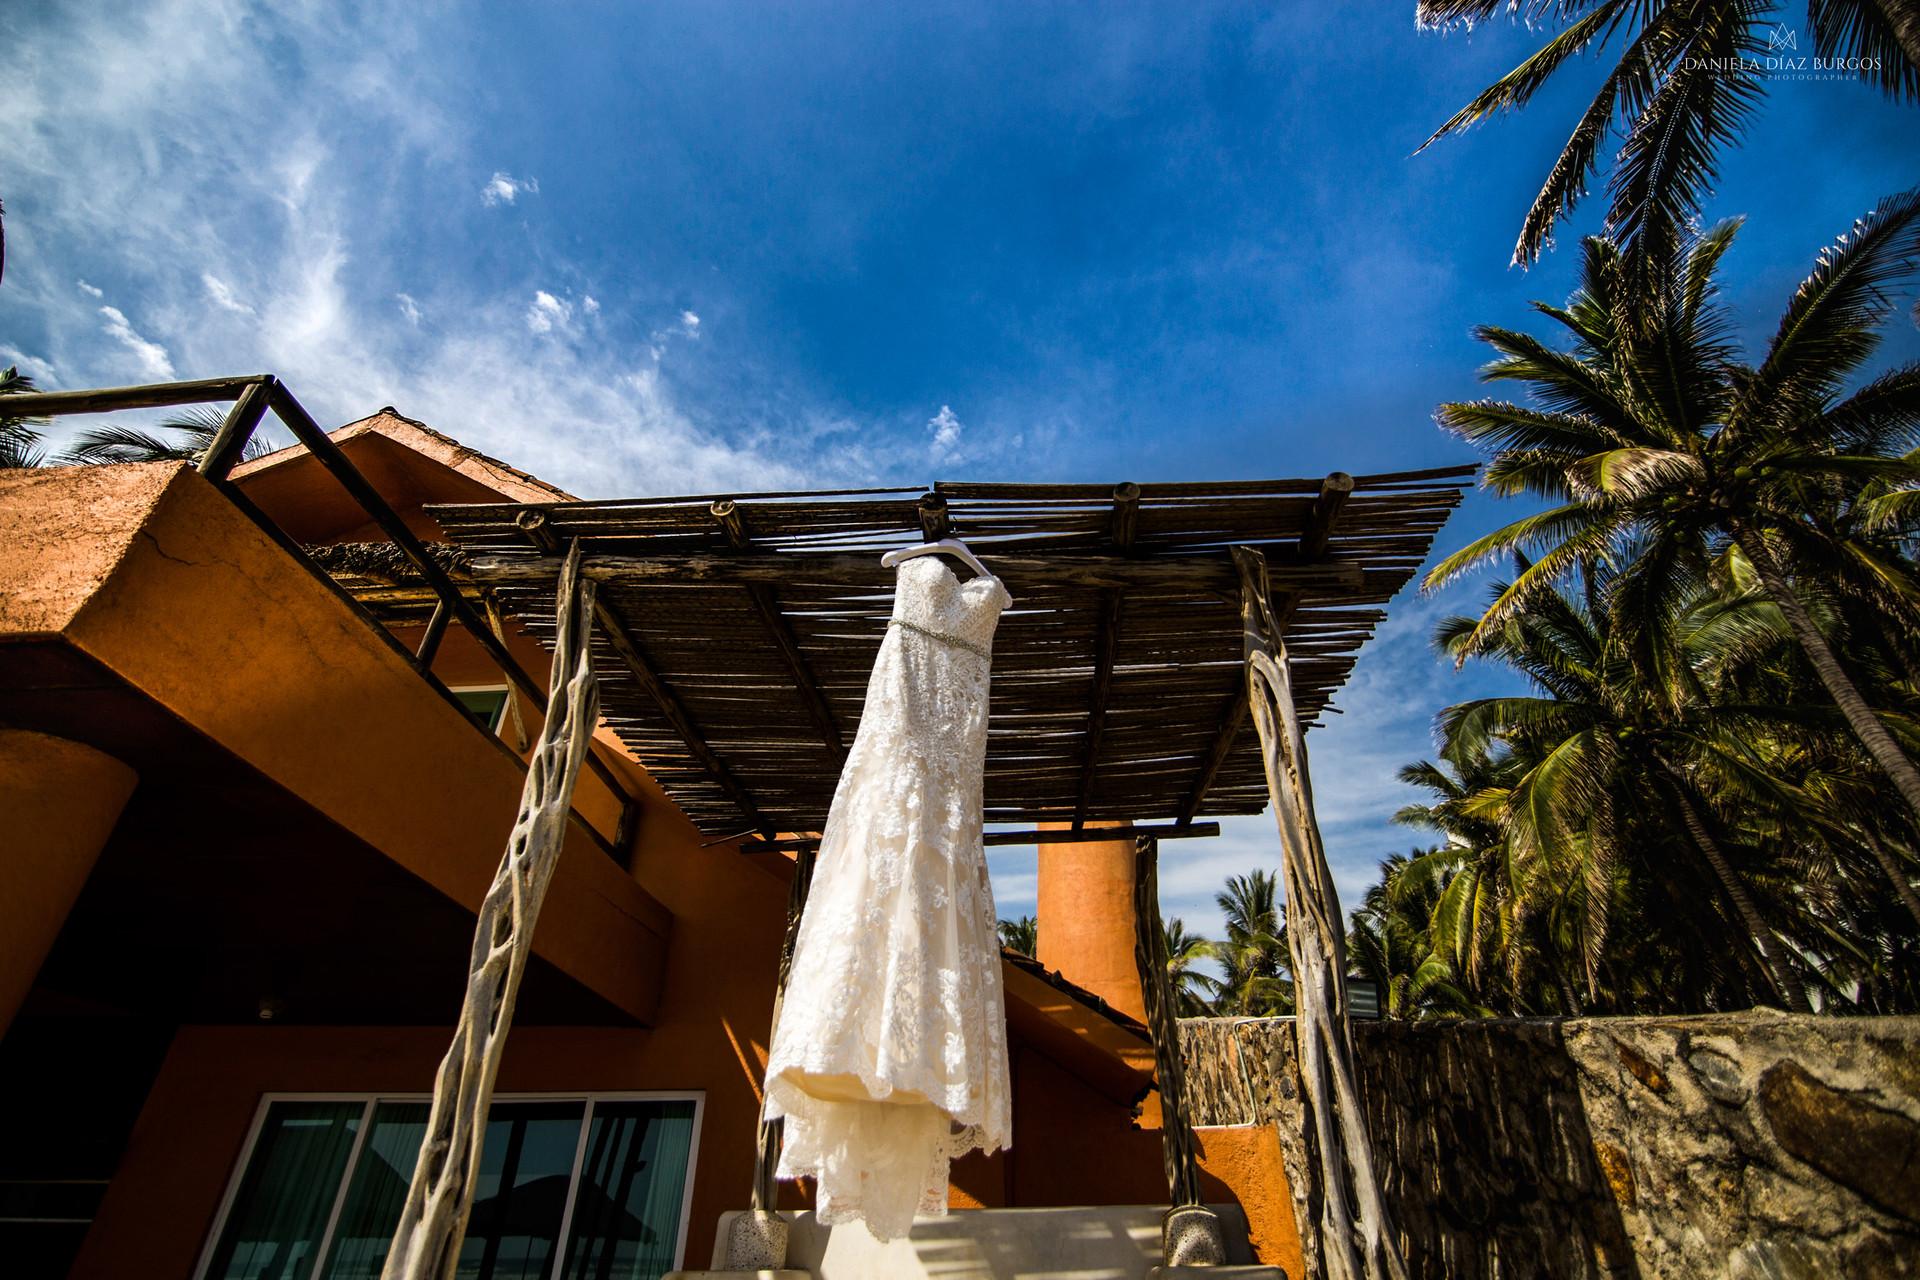 AnaC+Javier-Wedding-LD-12-COPIA.jpg